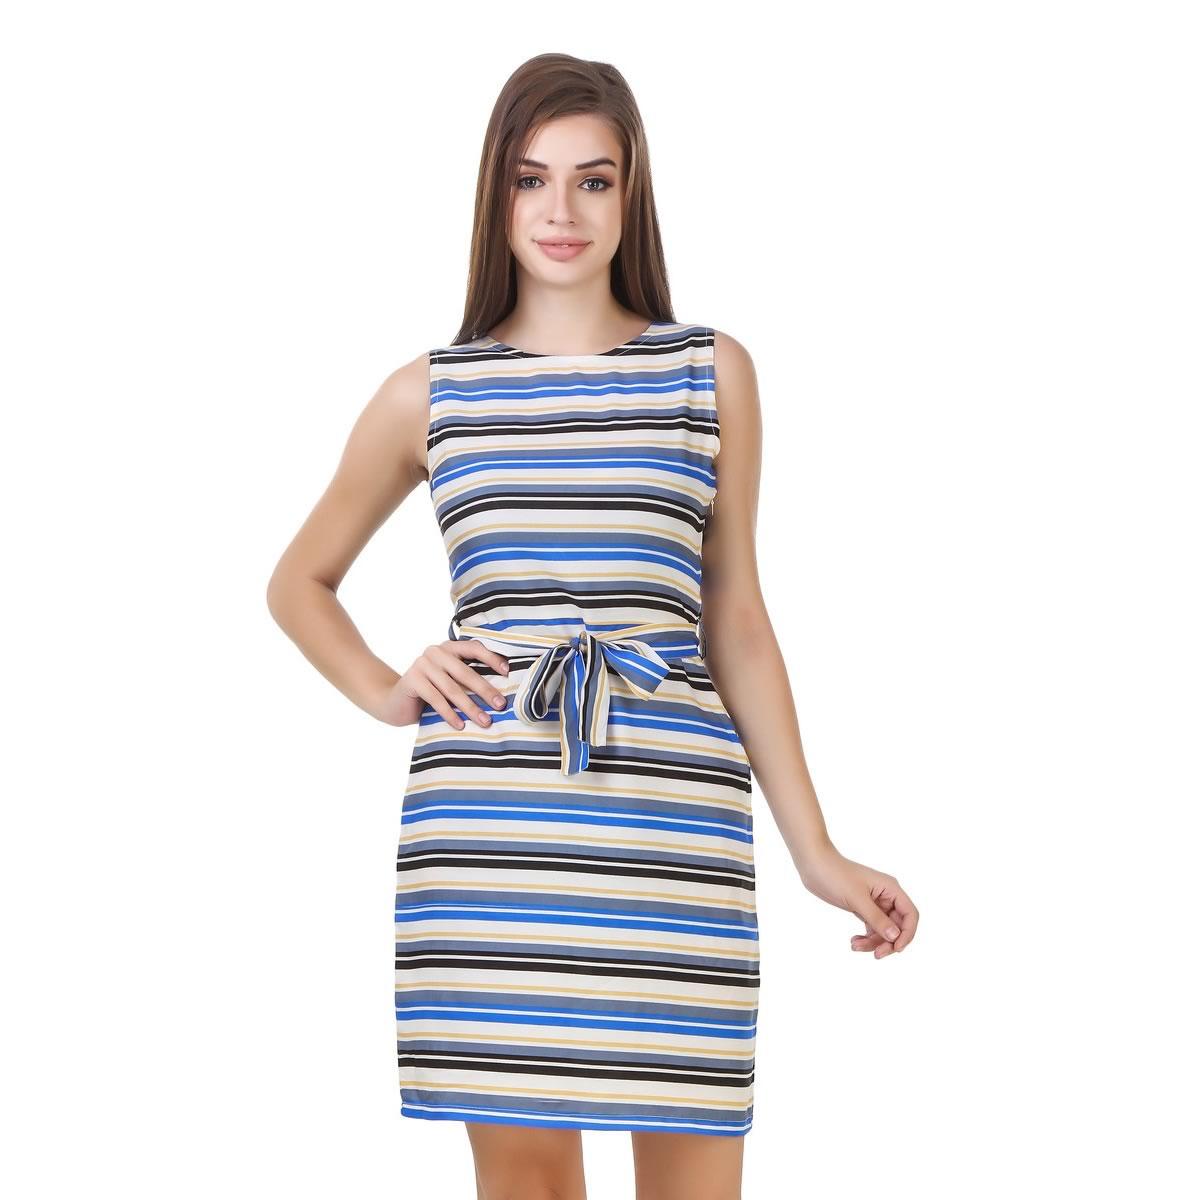 a801734a16fbc Stylish Horizontal Stripes Crepe Sheath Dress, Western Wear, Dresses. Online  Fashion Shopping Store in India